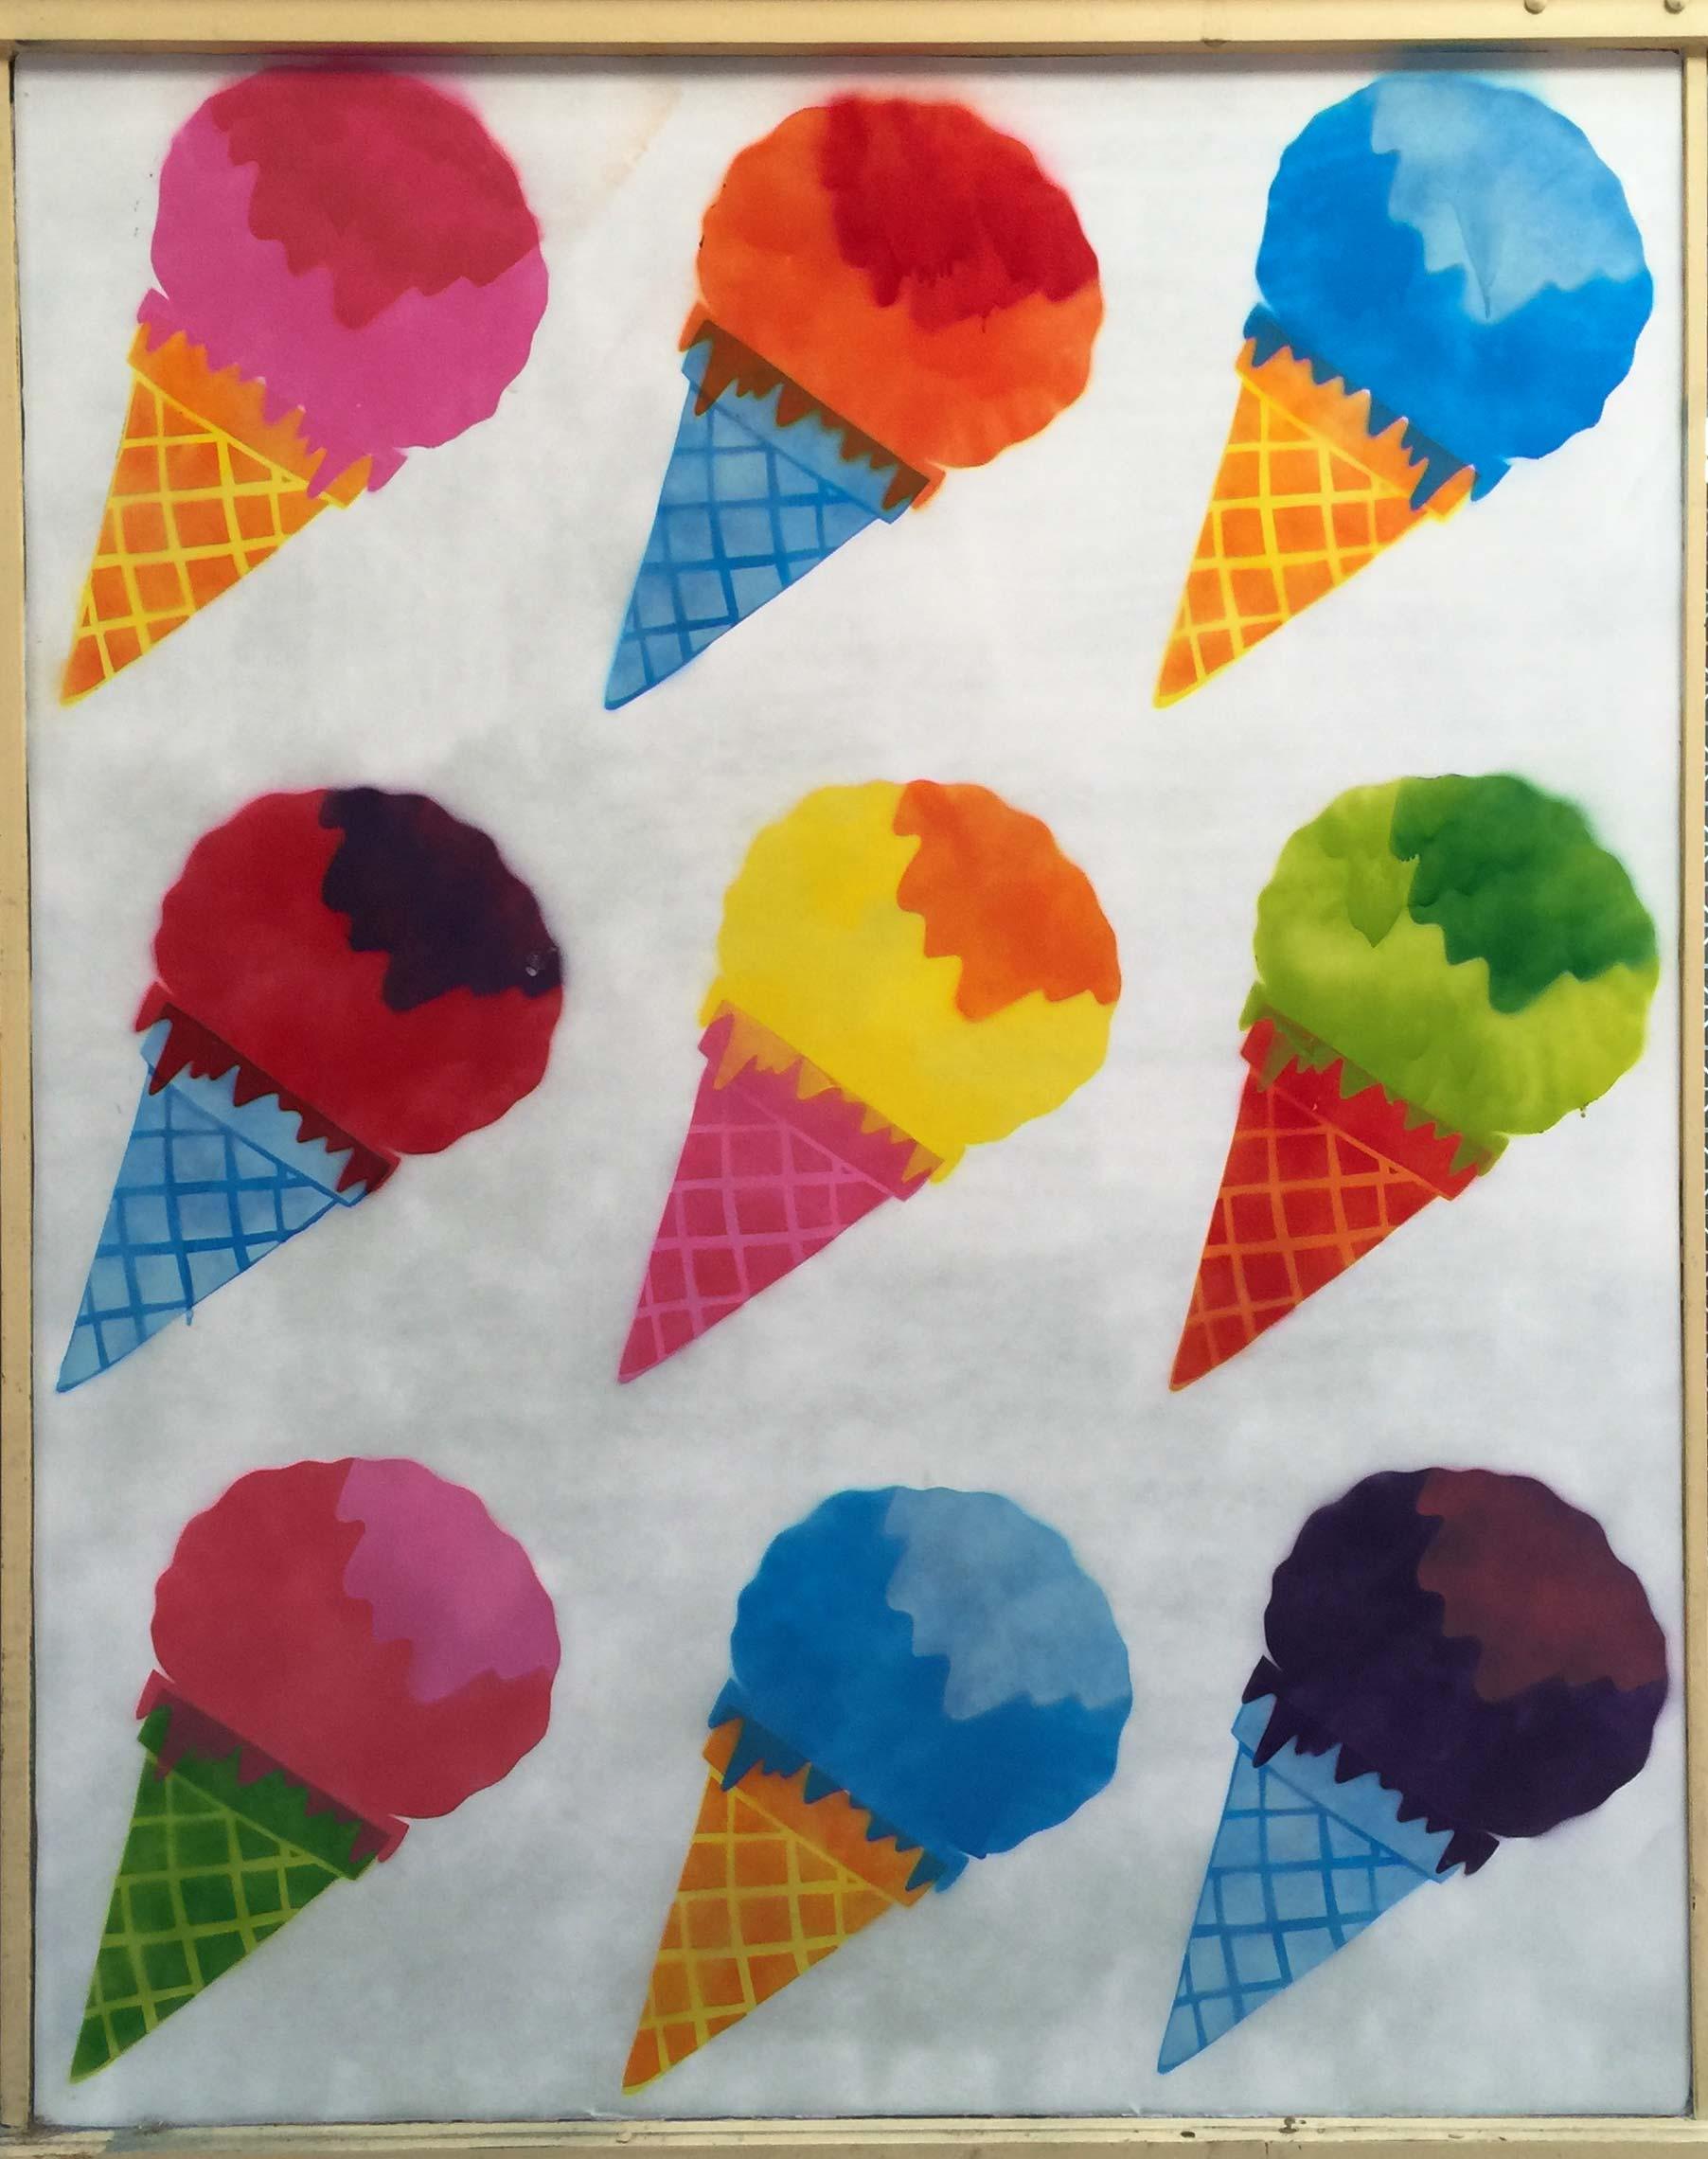 ice-cream-allans-walk-bendigo-mural-stencil